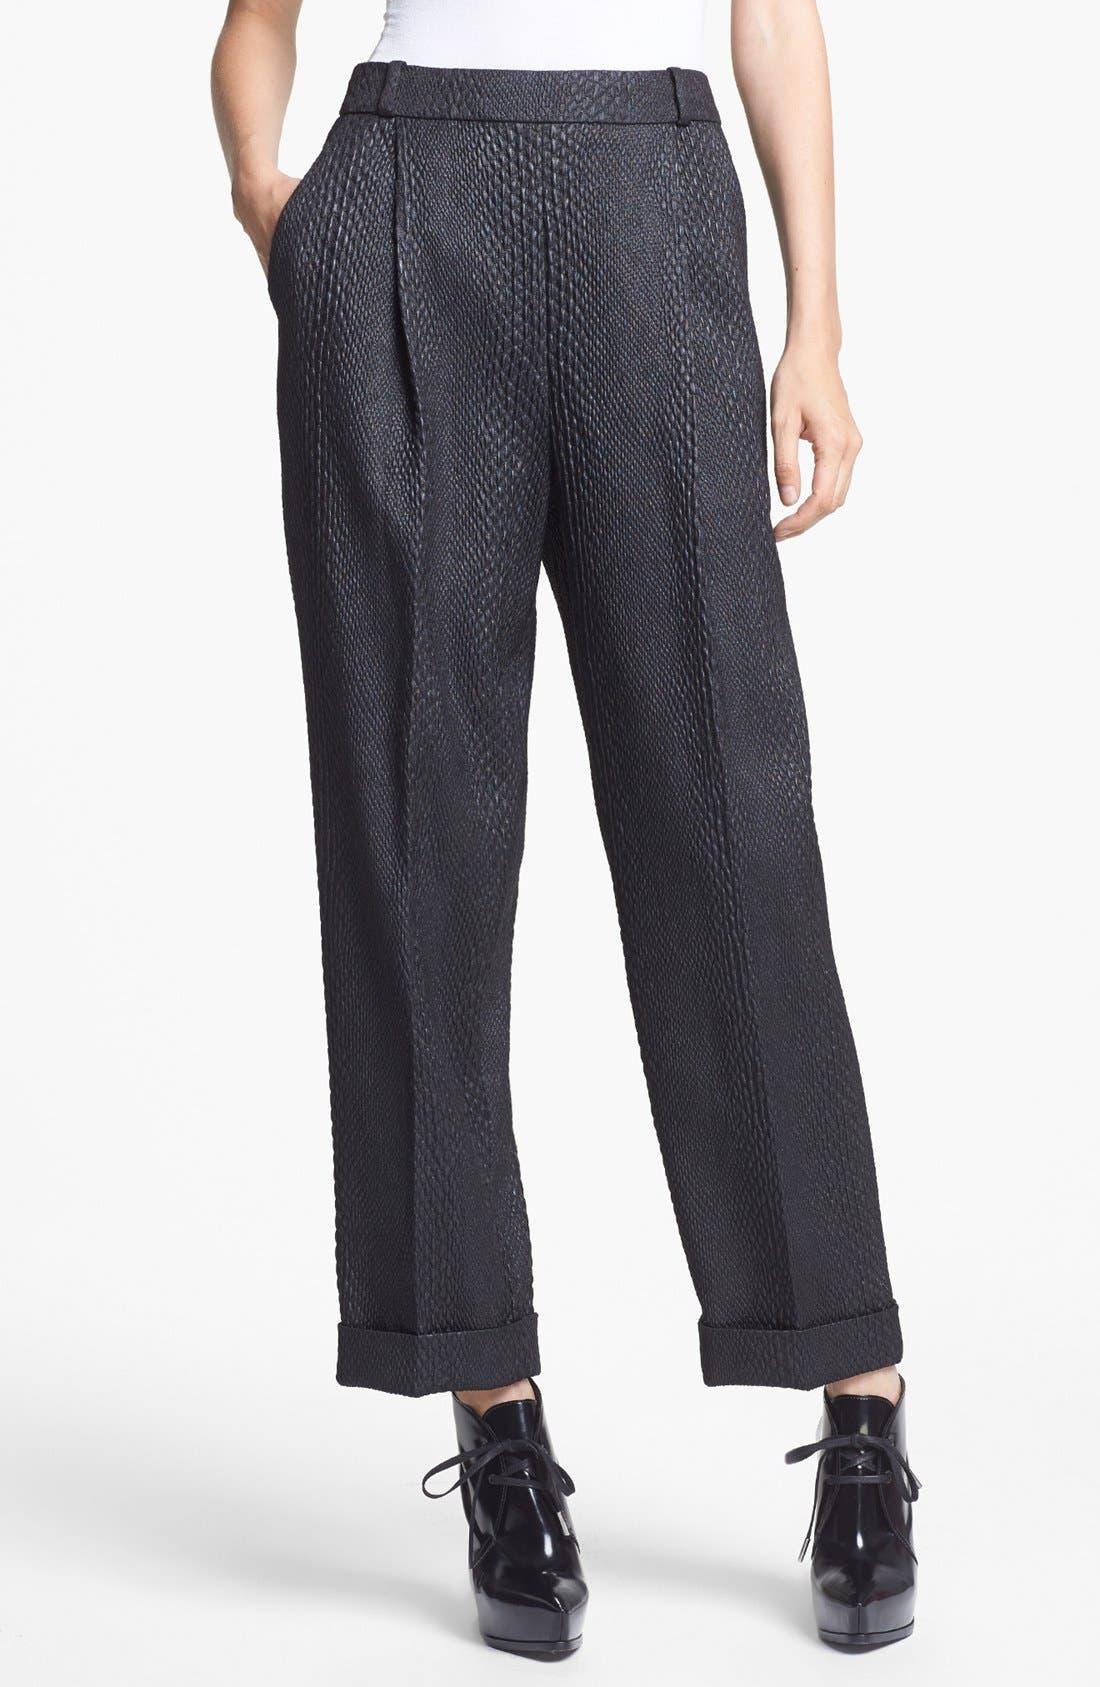 Alternate Image 1 Selected - J Brand Ready-to-Wear 'Asawa' Snakeskin Brocade Trousers